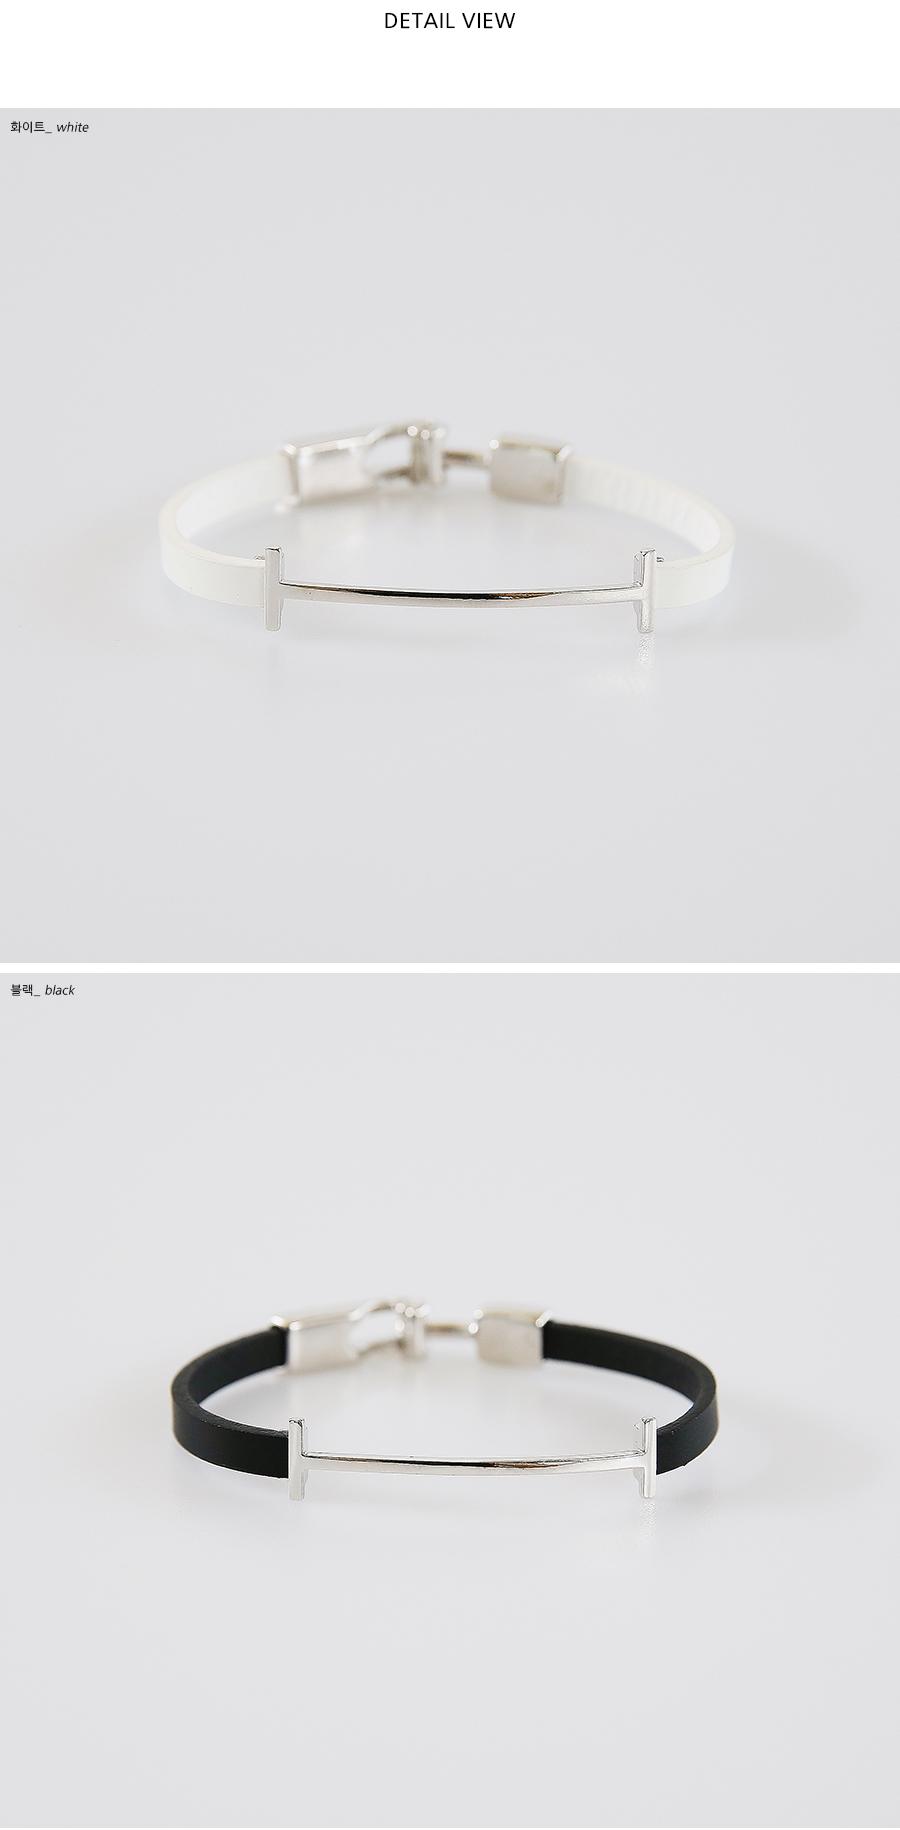 leather metal mix bracelets